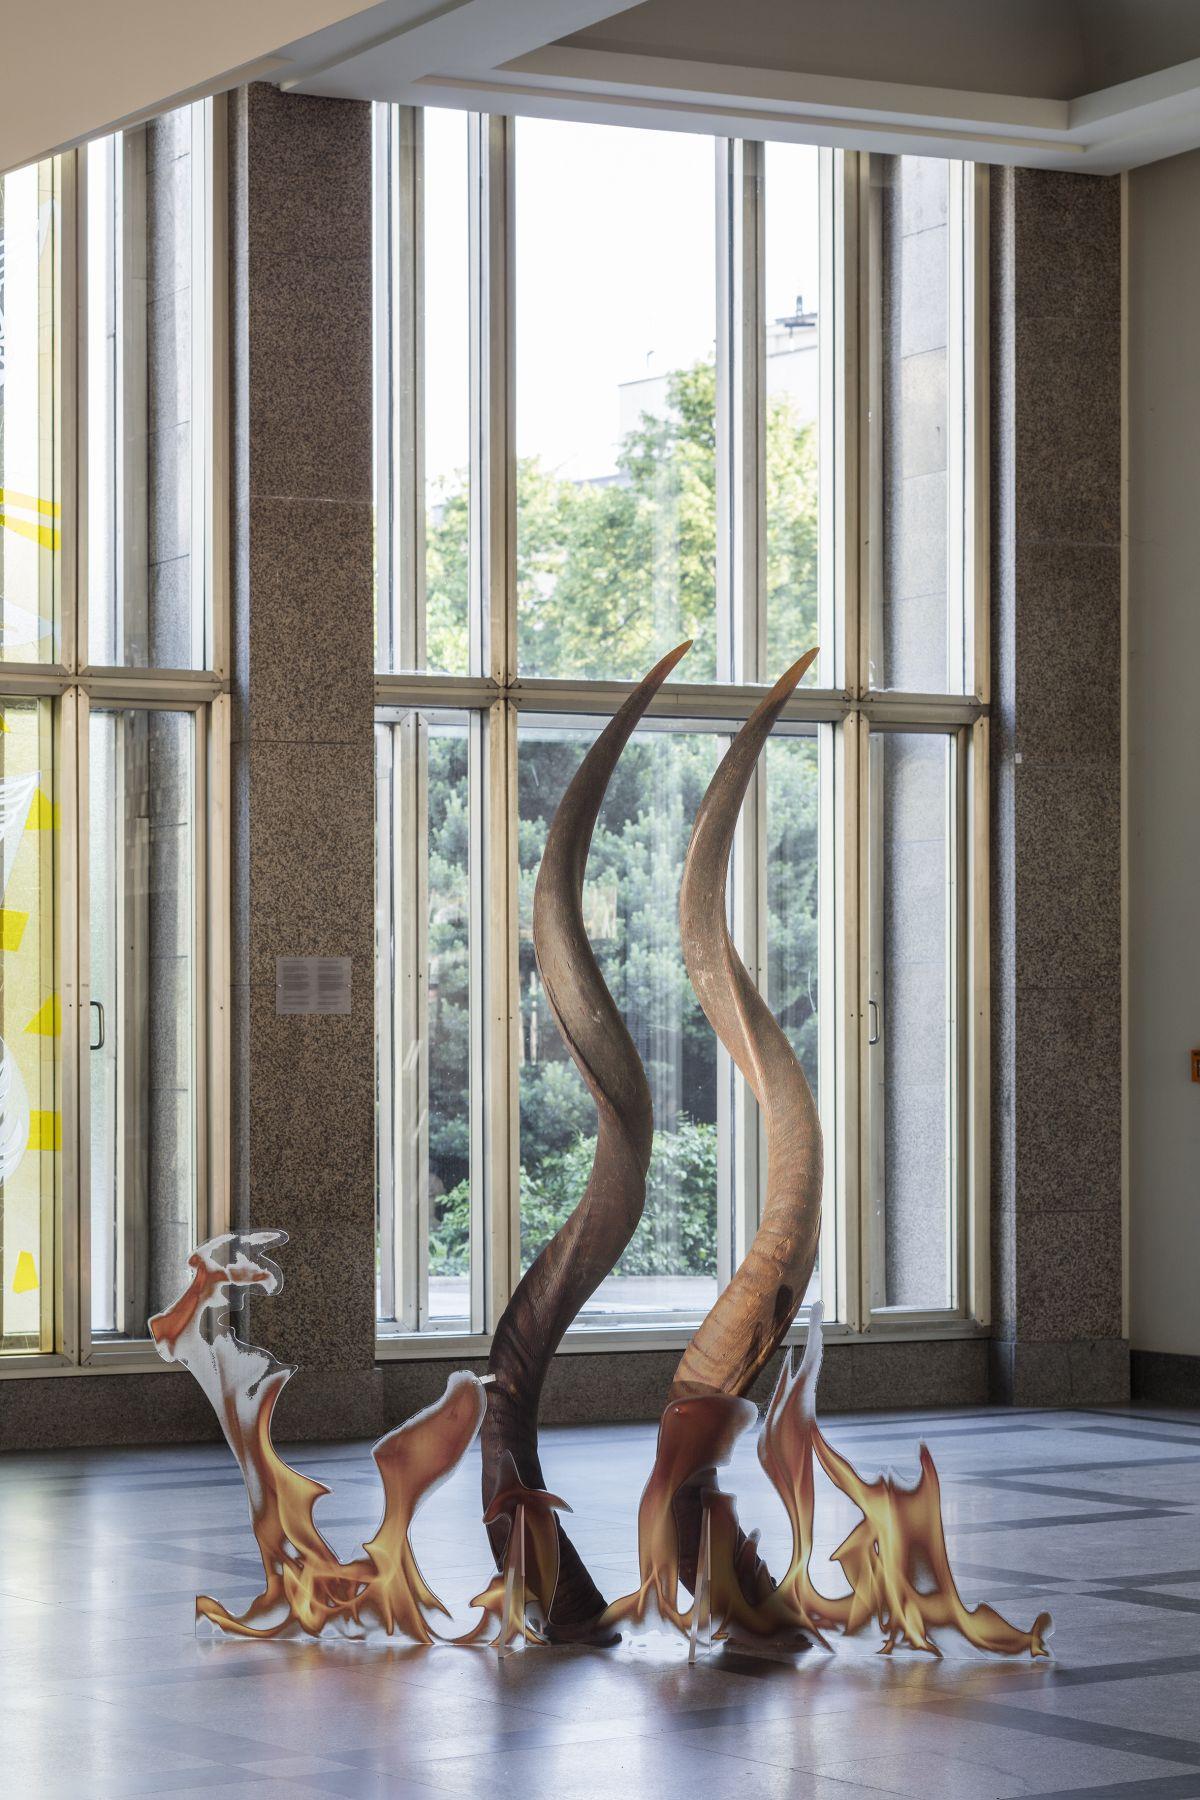 Katja Novitskova, Neolithic Potential (Fire Worship, Spiral Horns), 2016